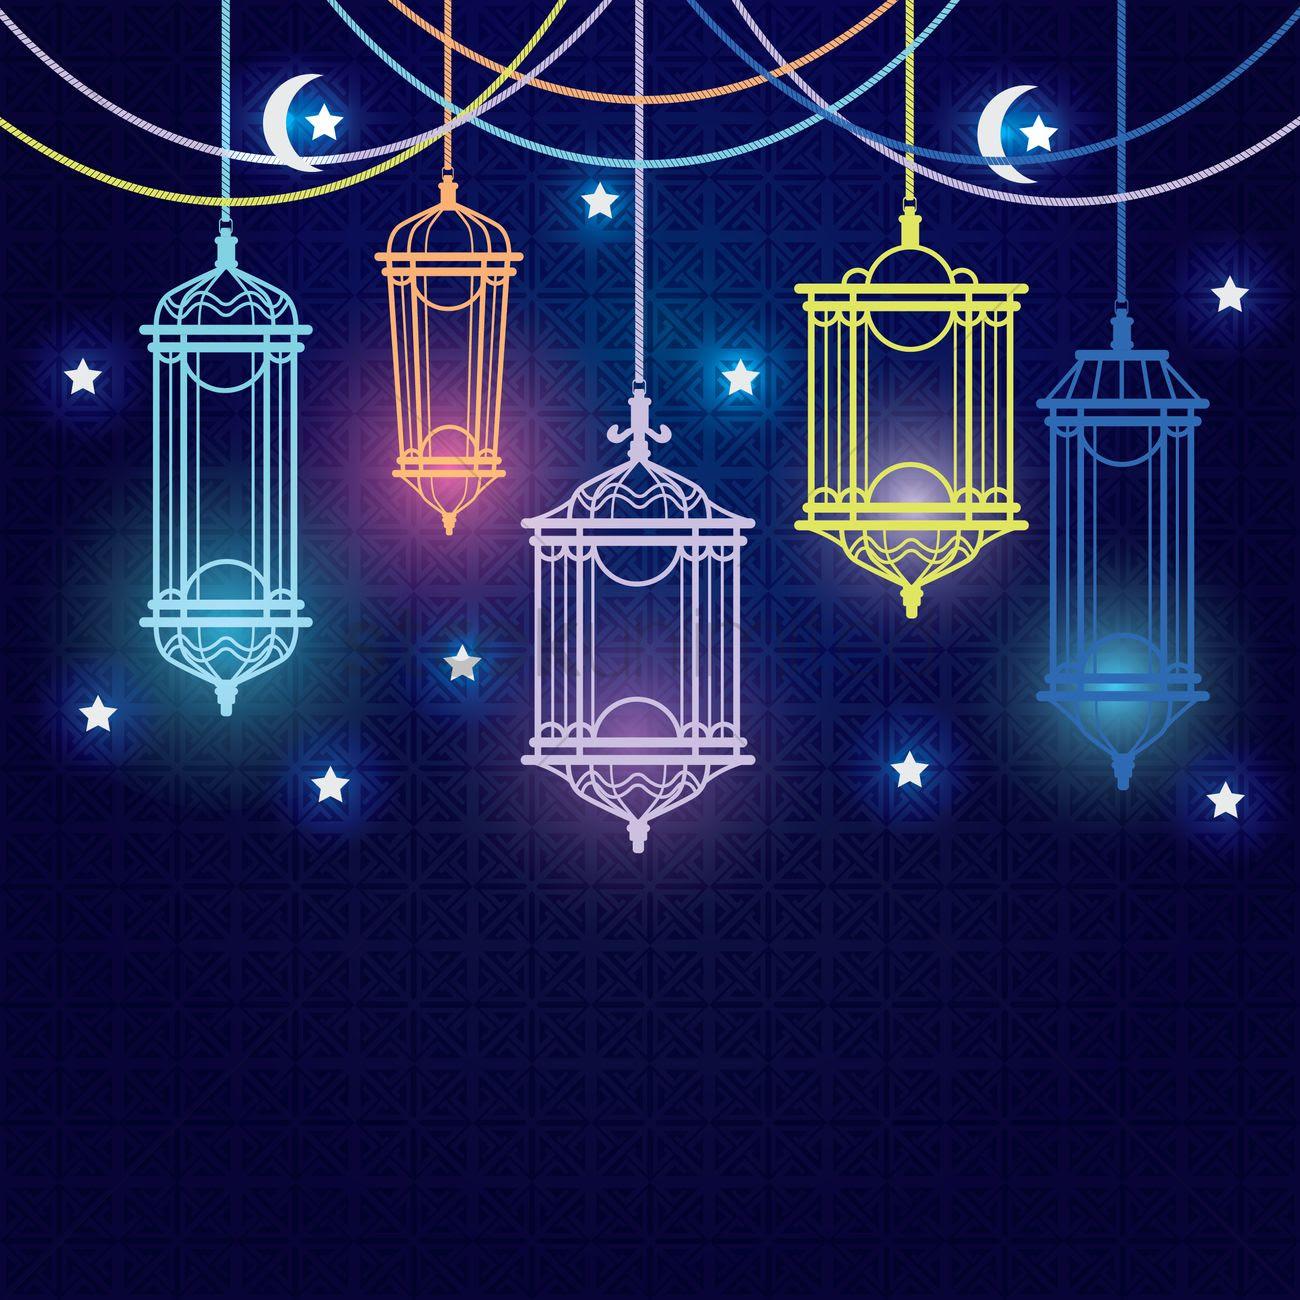 Hari raya card design Vector Image 1996941 StockUnlimited